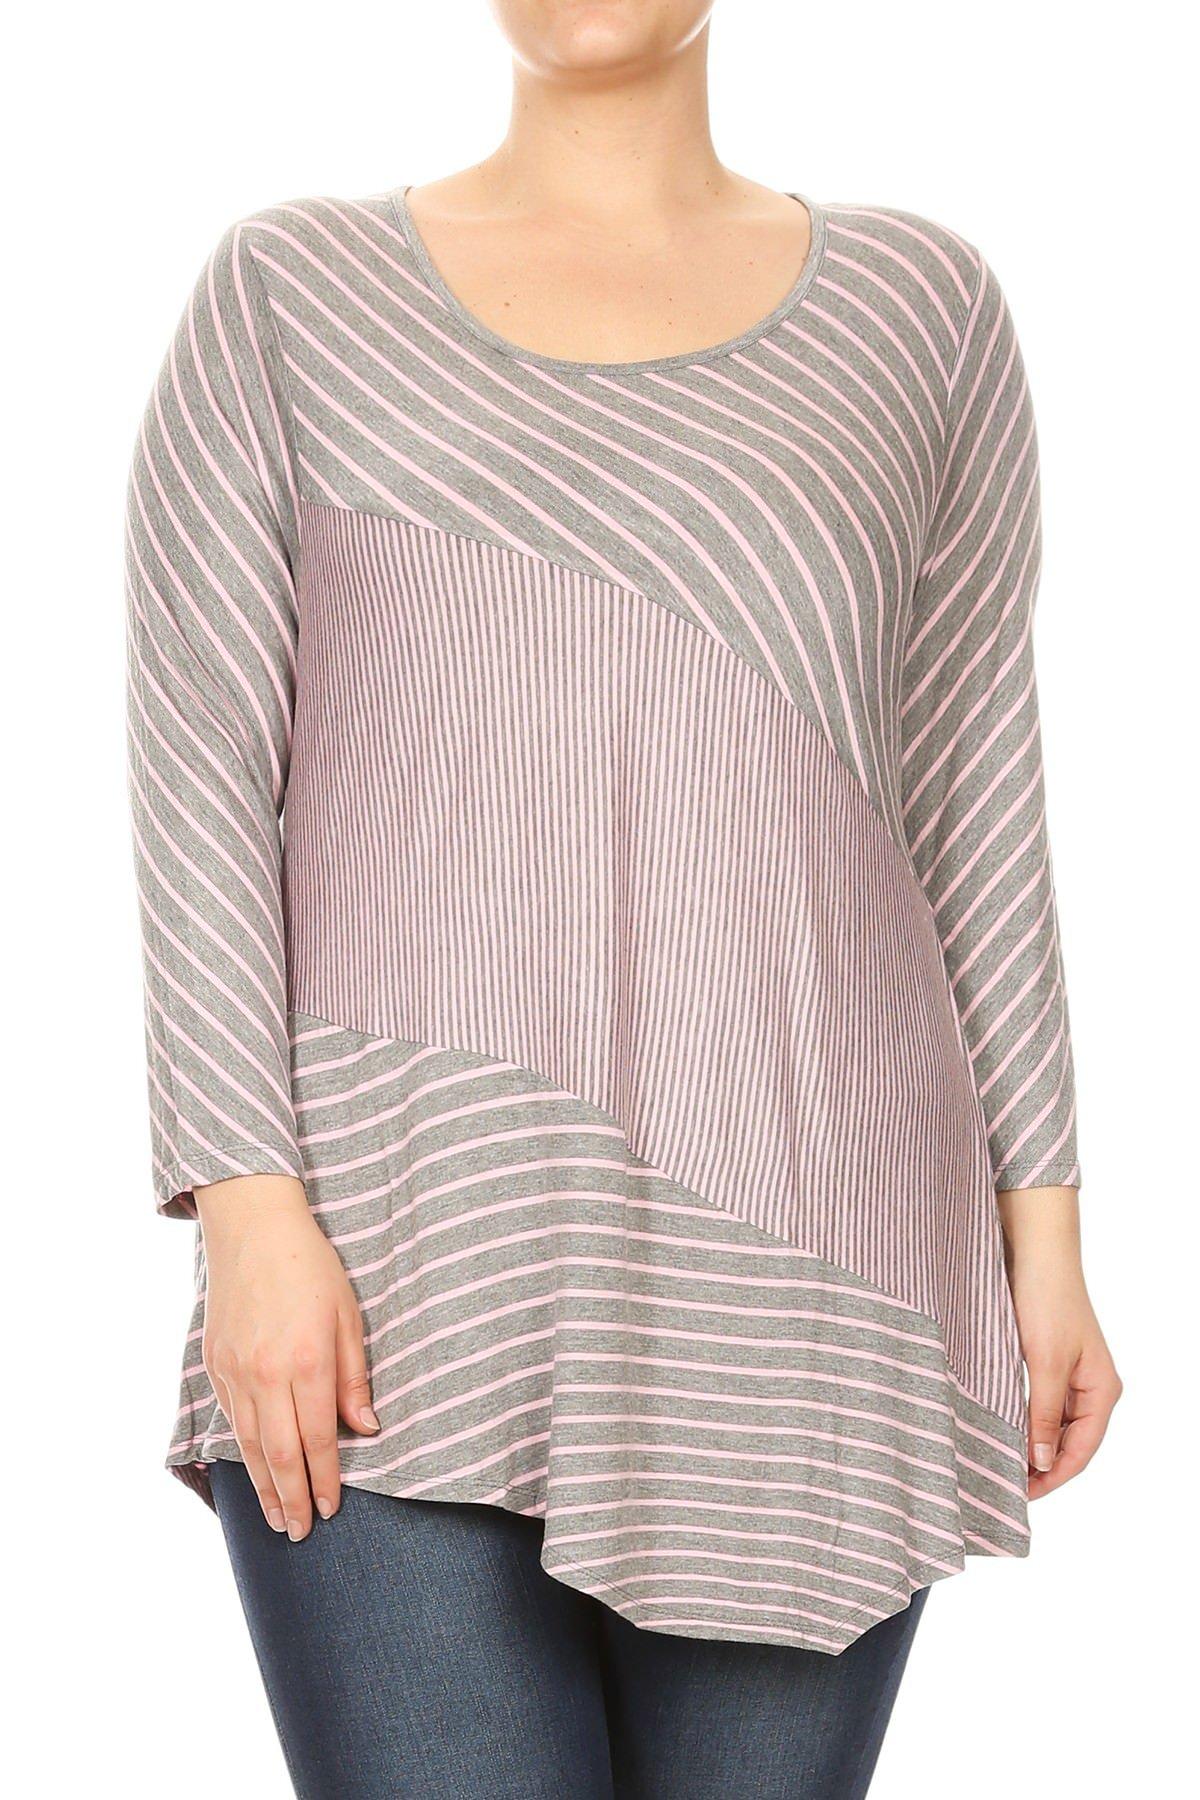 Aki Shop Women Plus Size Striped Style 3/4 Sleeve Keyhole Back Top Tee Blouse Grey Pink 3XL SE16009-4